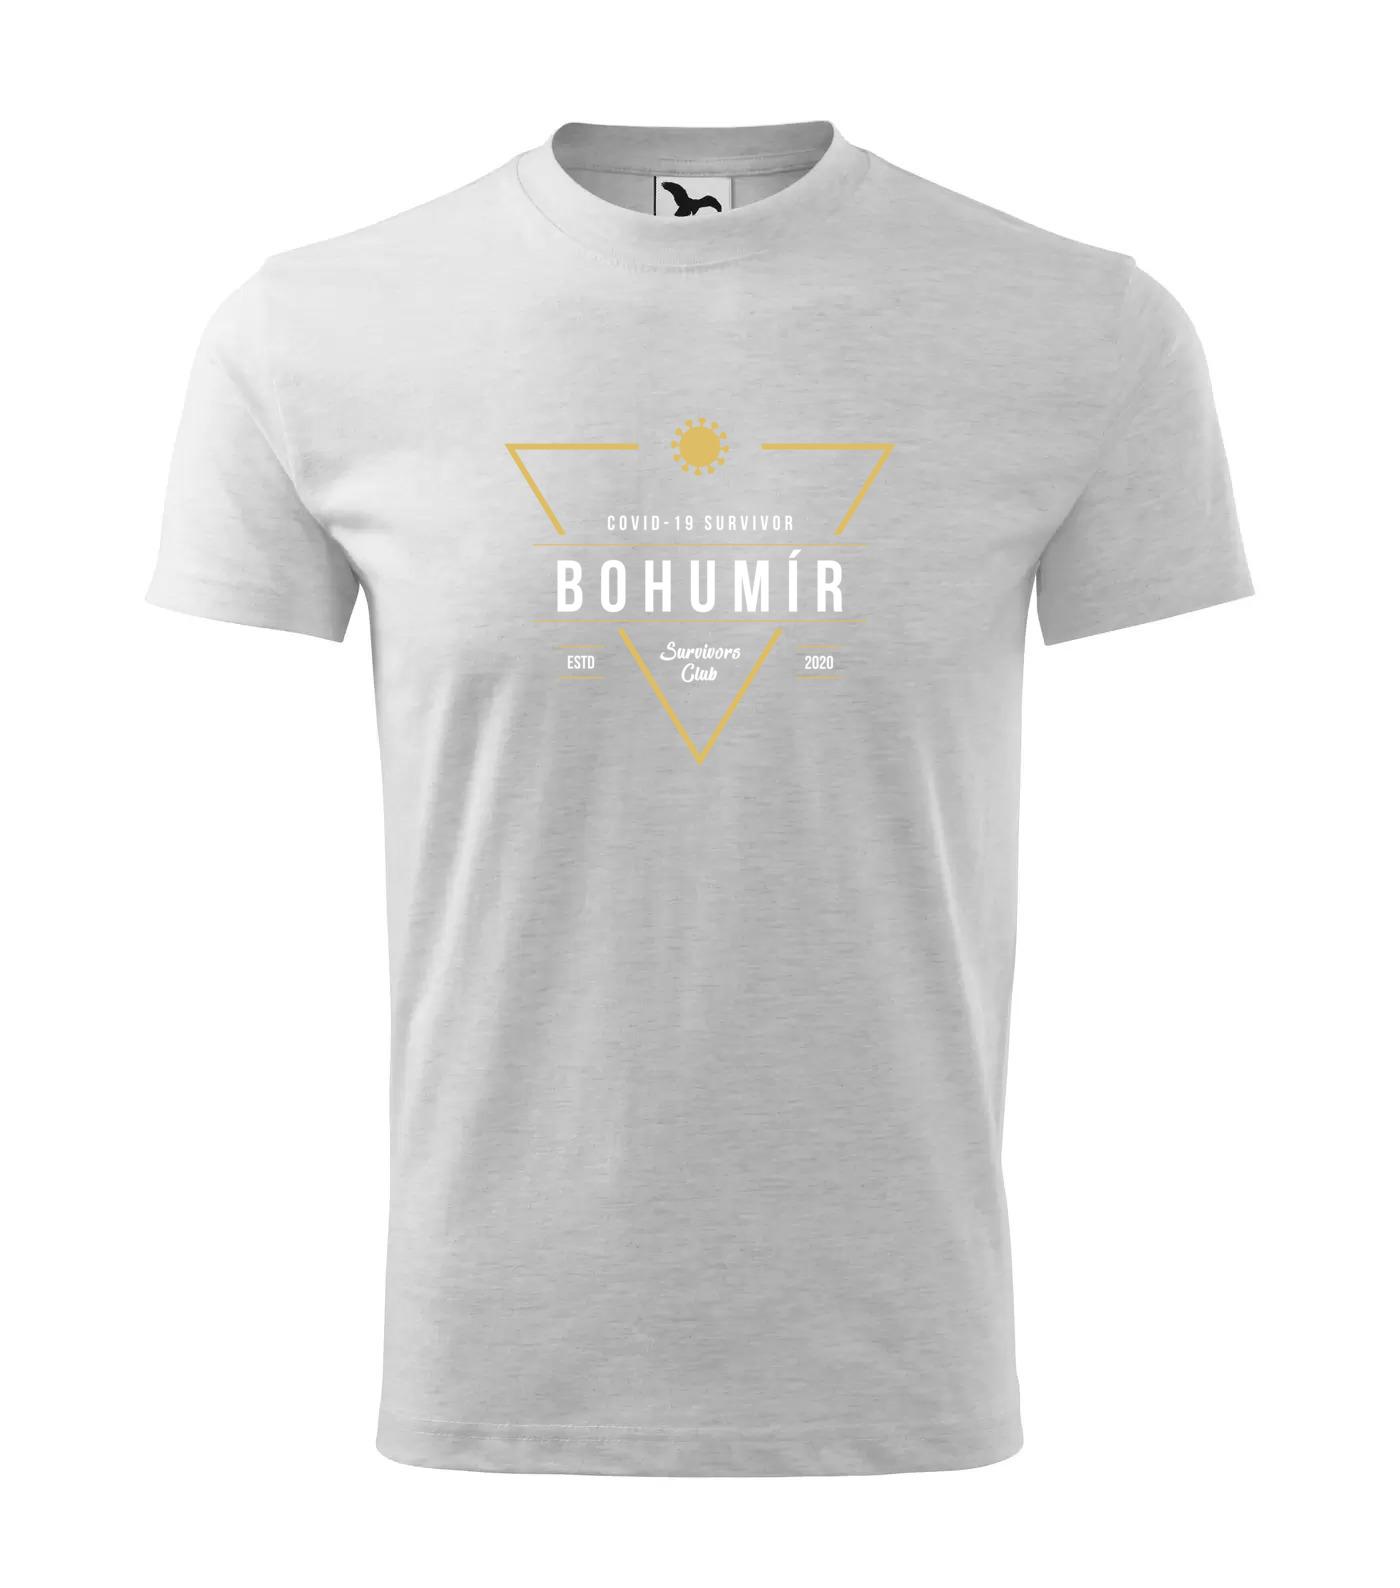 Tričko Survivor Club Bohumír